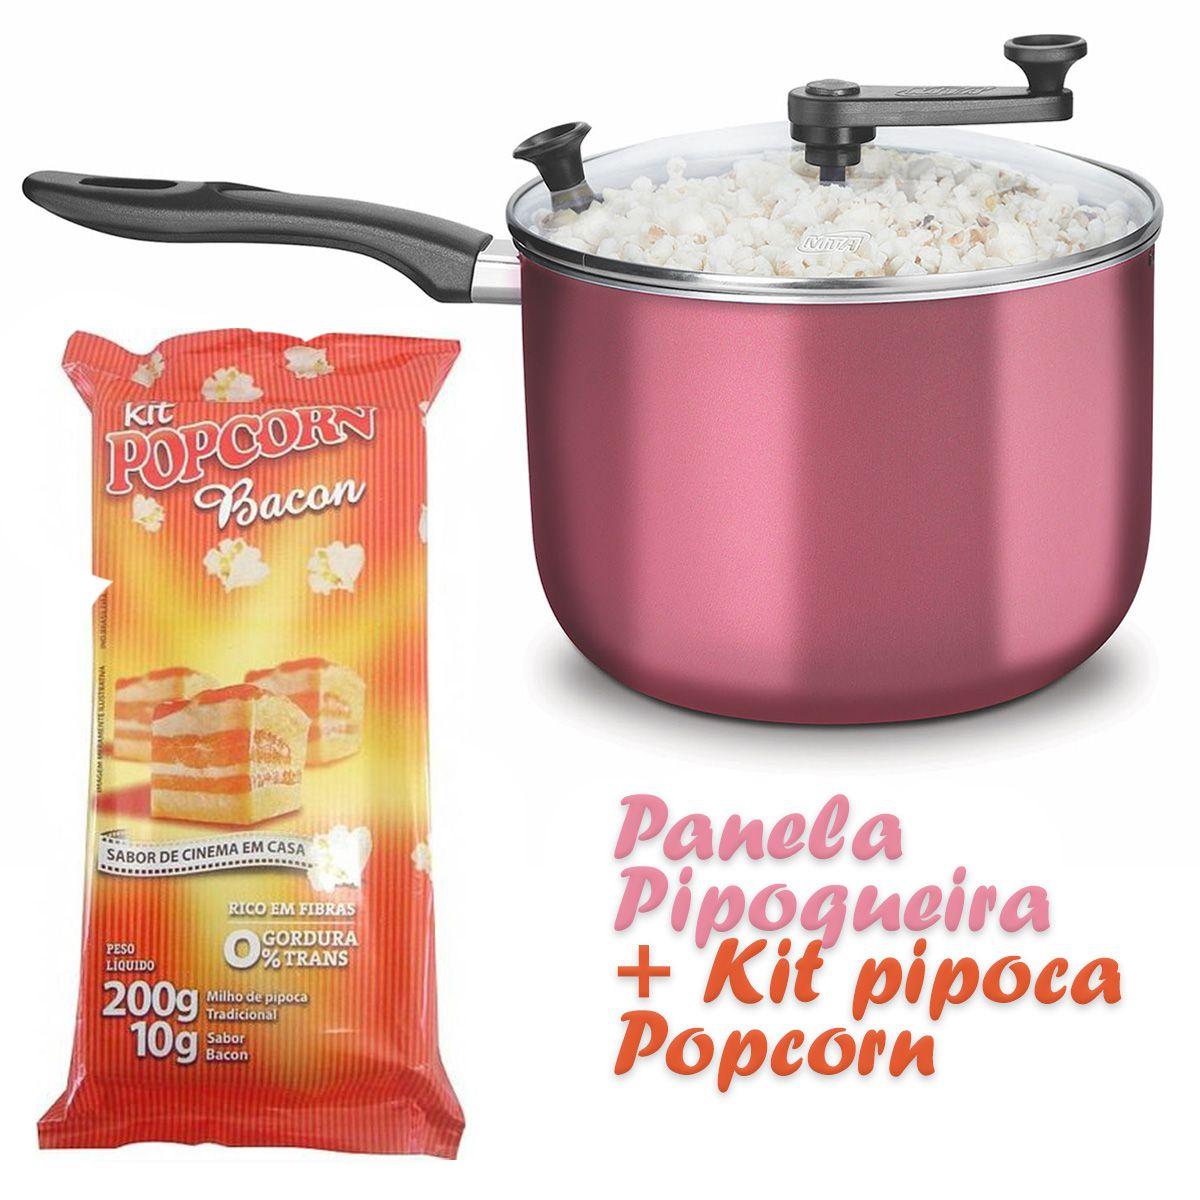 Pipoqueira Panela com Tampa de Vidro + Kit pipoca Salgada sabor Bacon